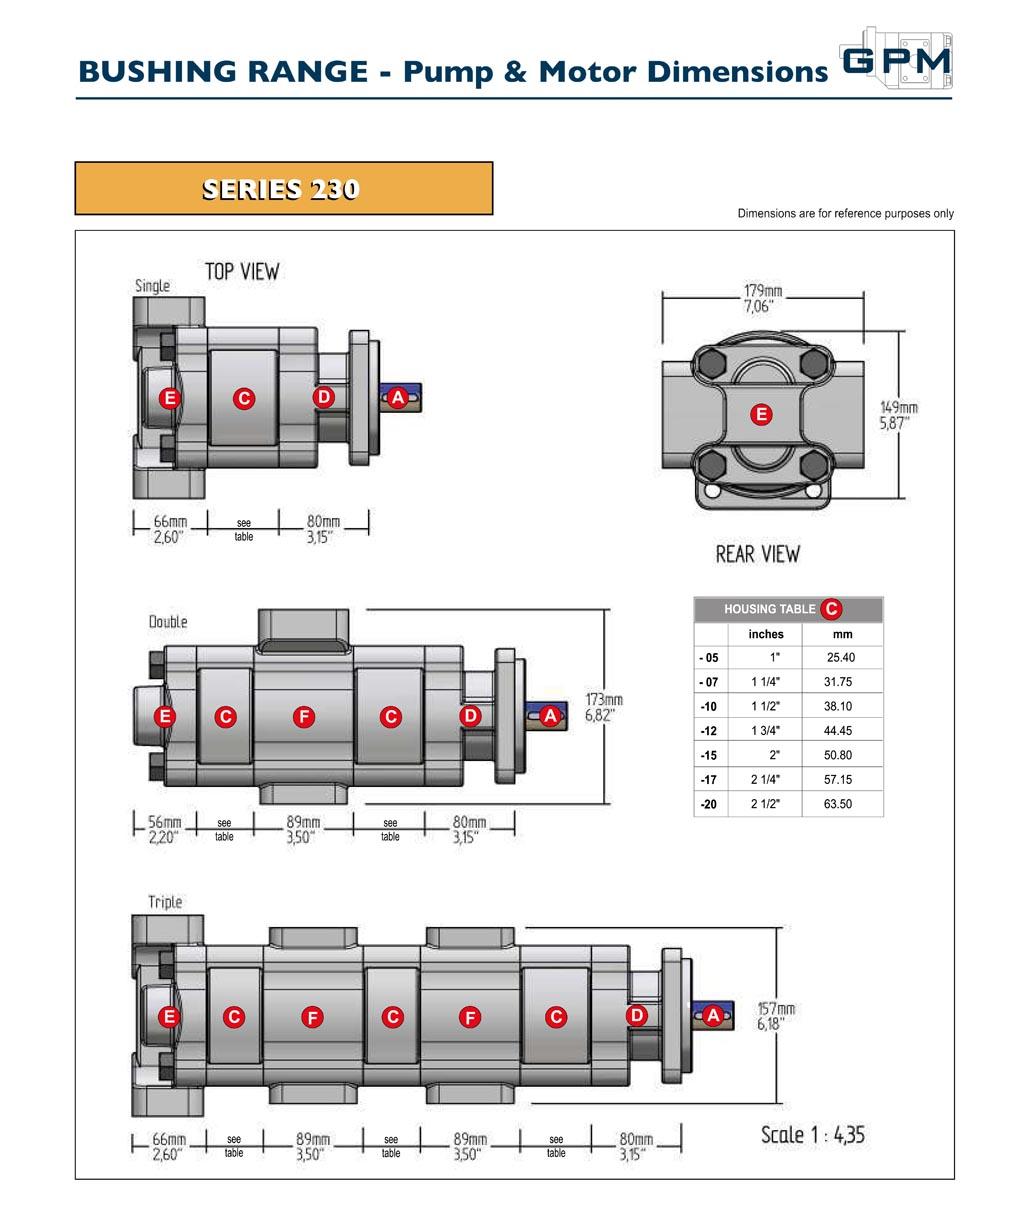 GPM Bushing Pump & Motor Dimensions-2